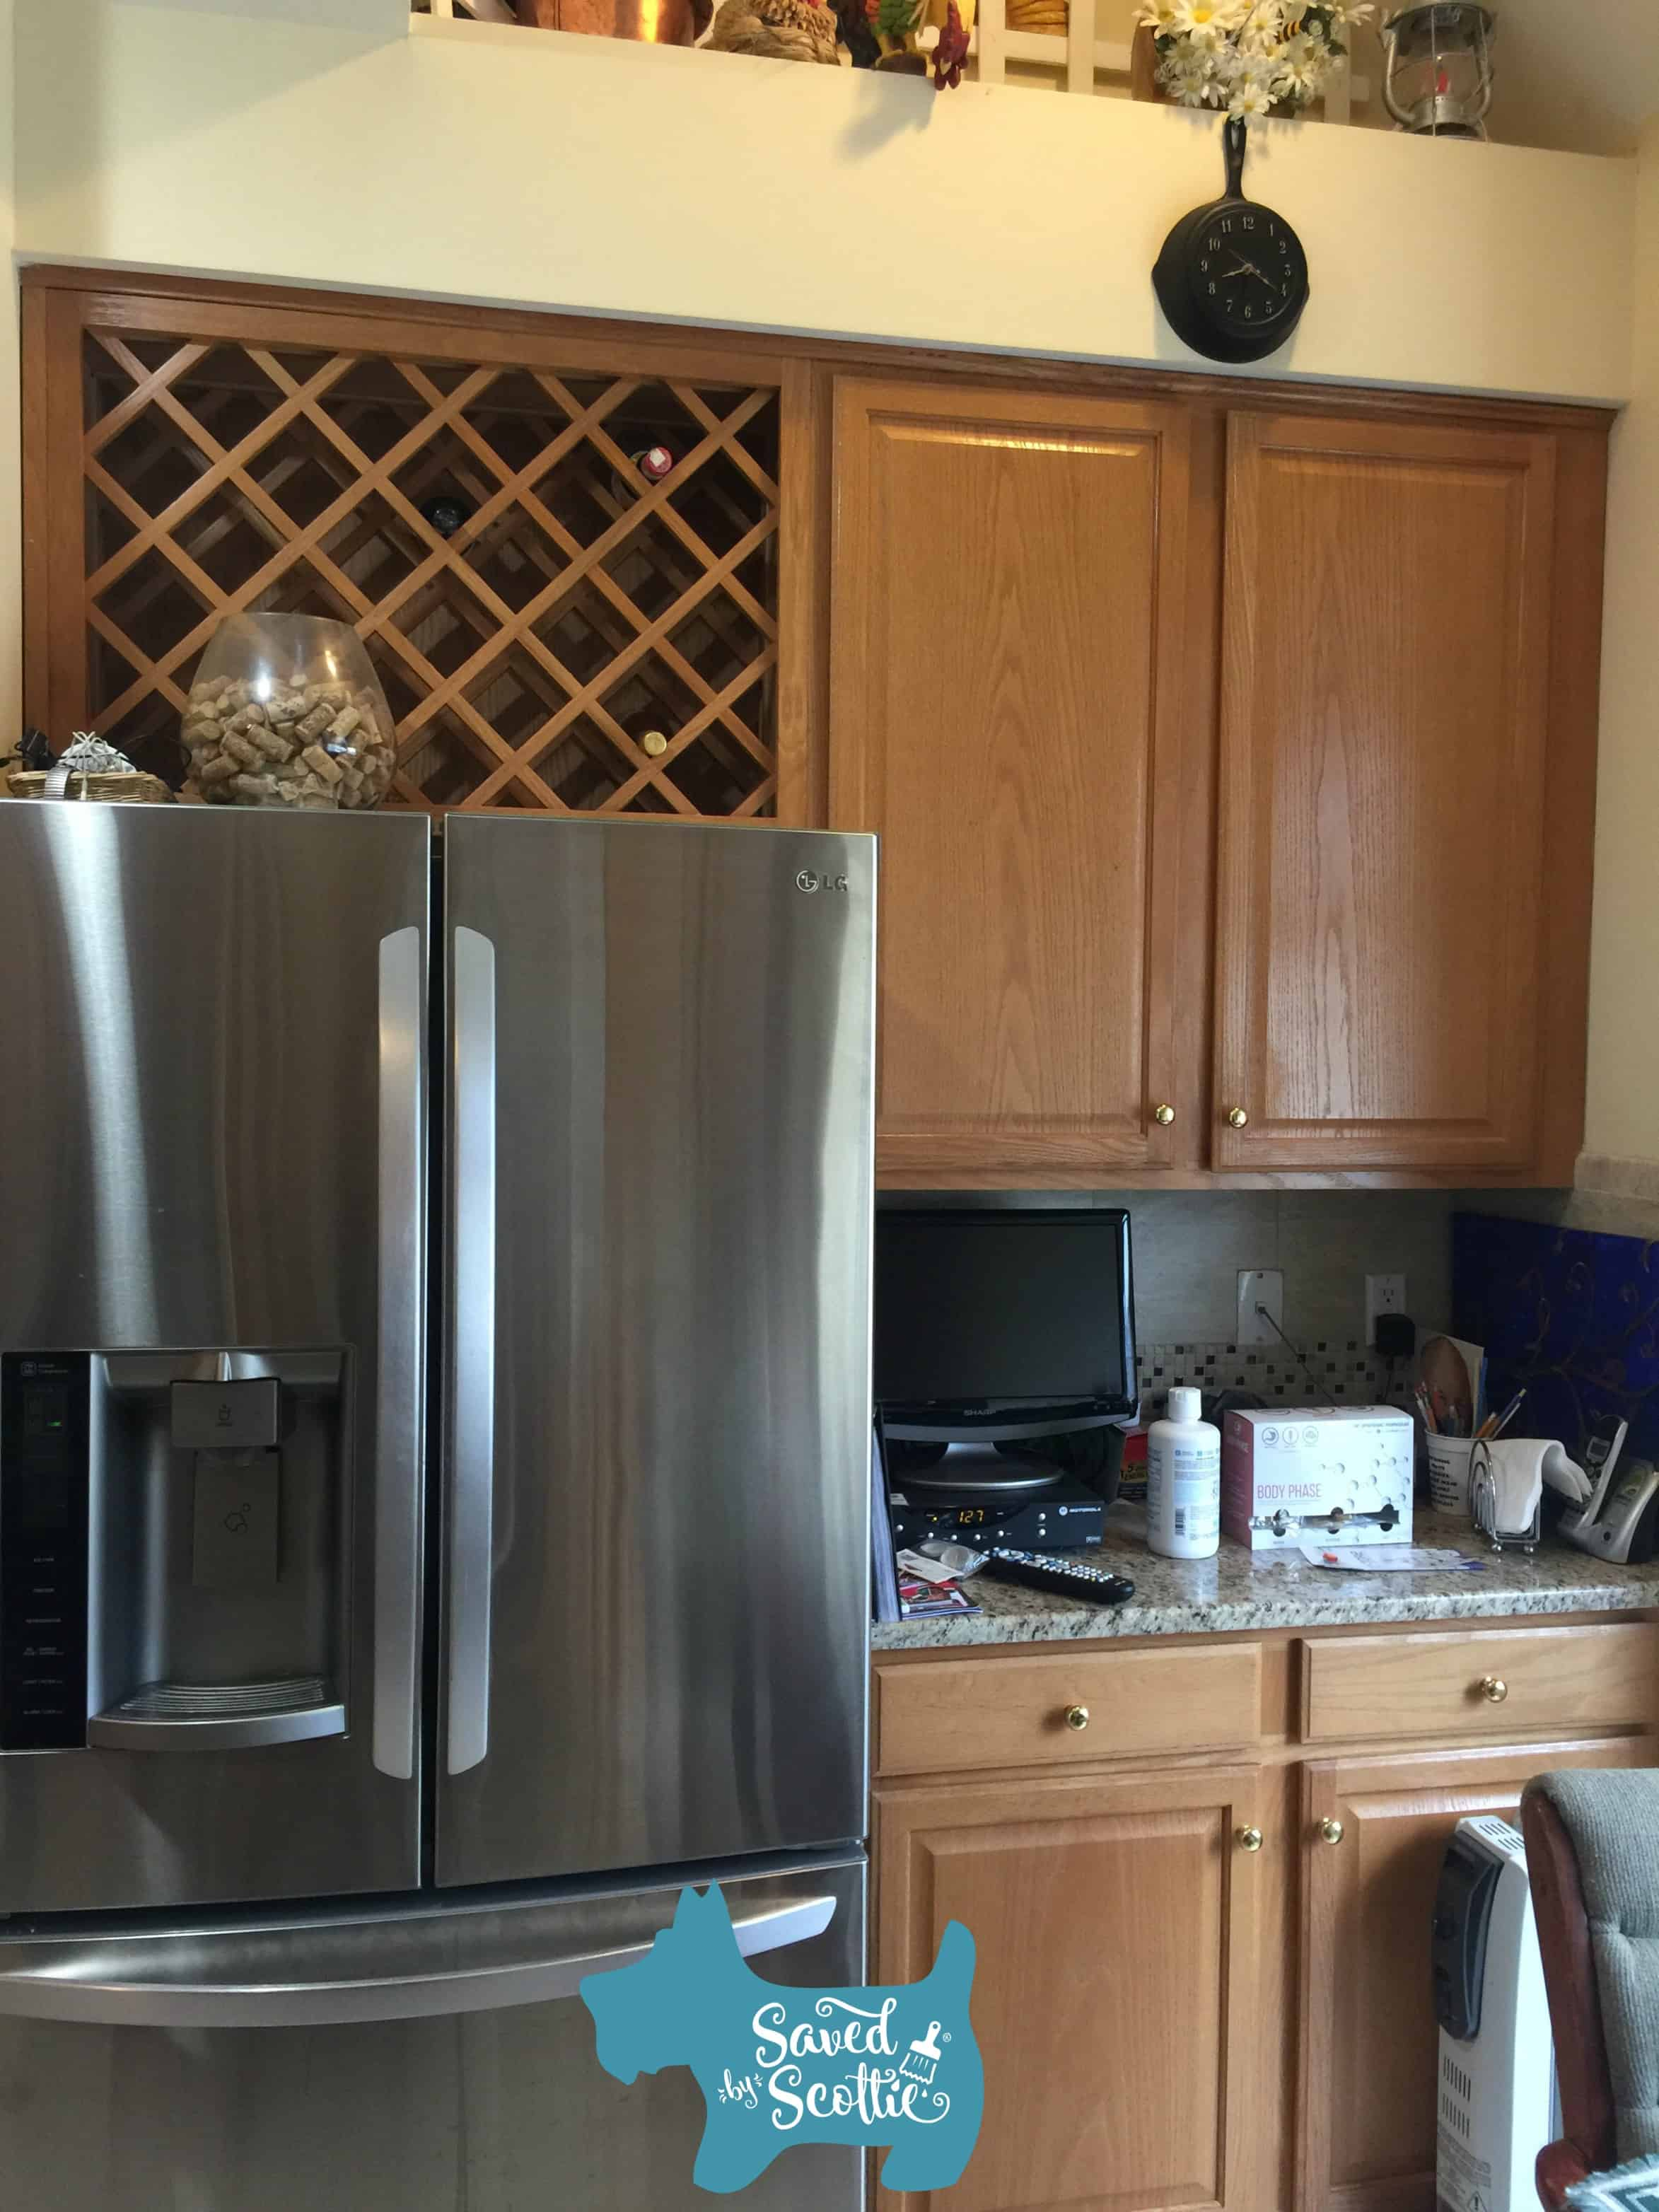 Saved by Scottie Alamo kitchen fridge before